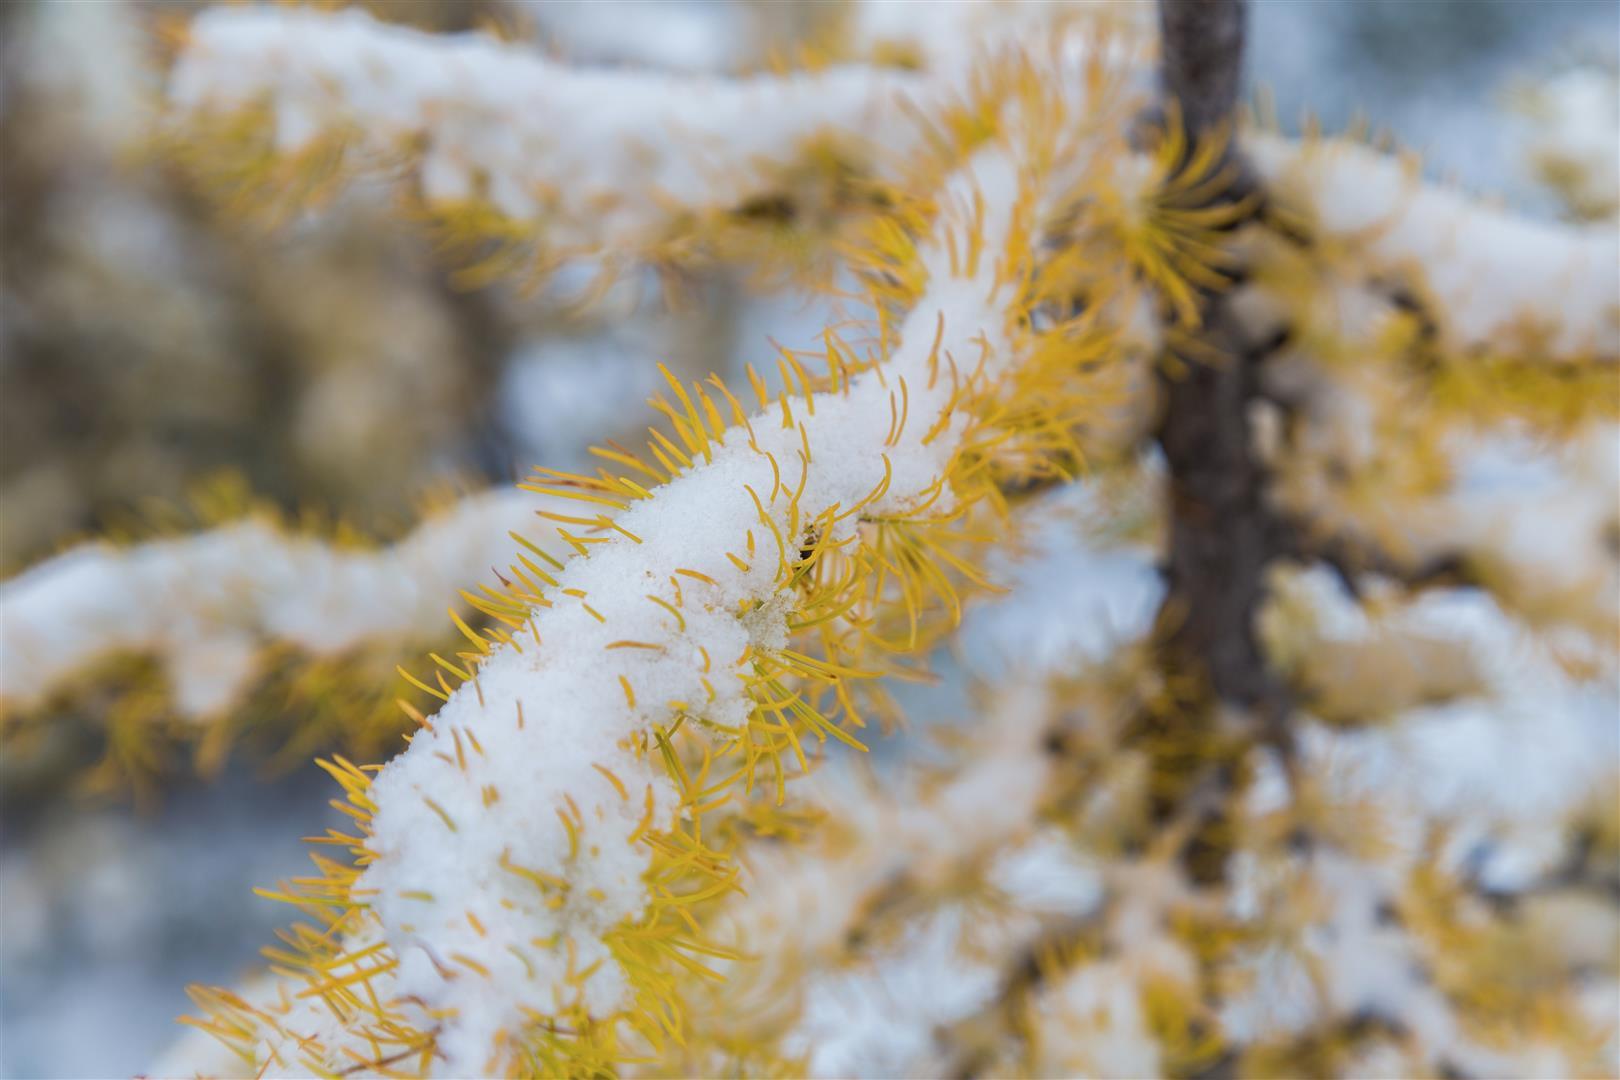 Snow on a golden alpine larch